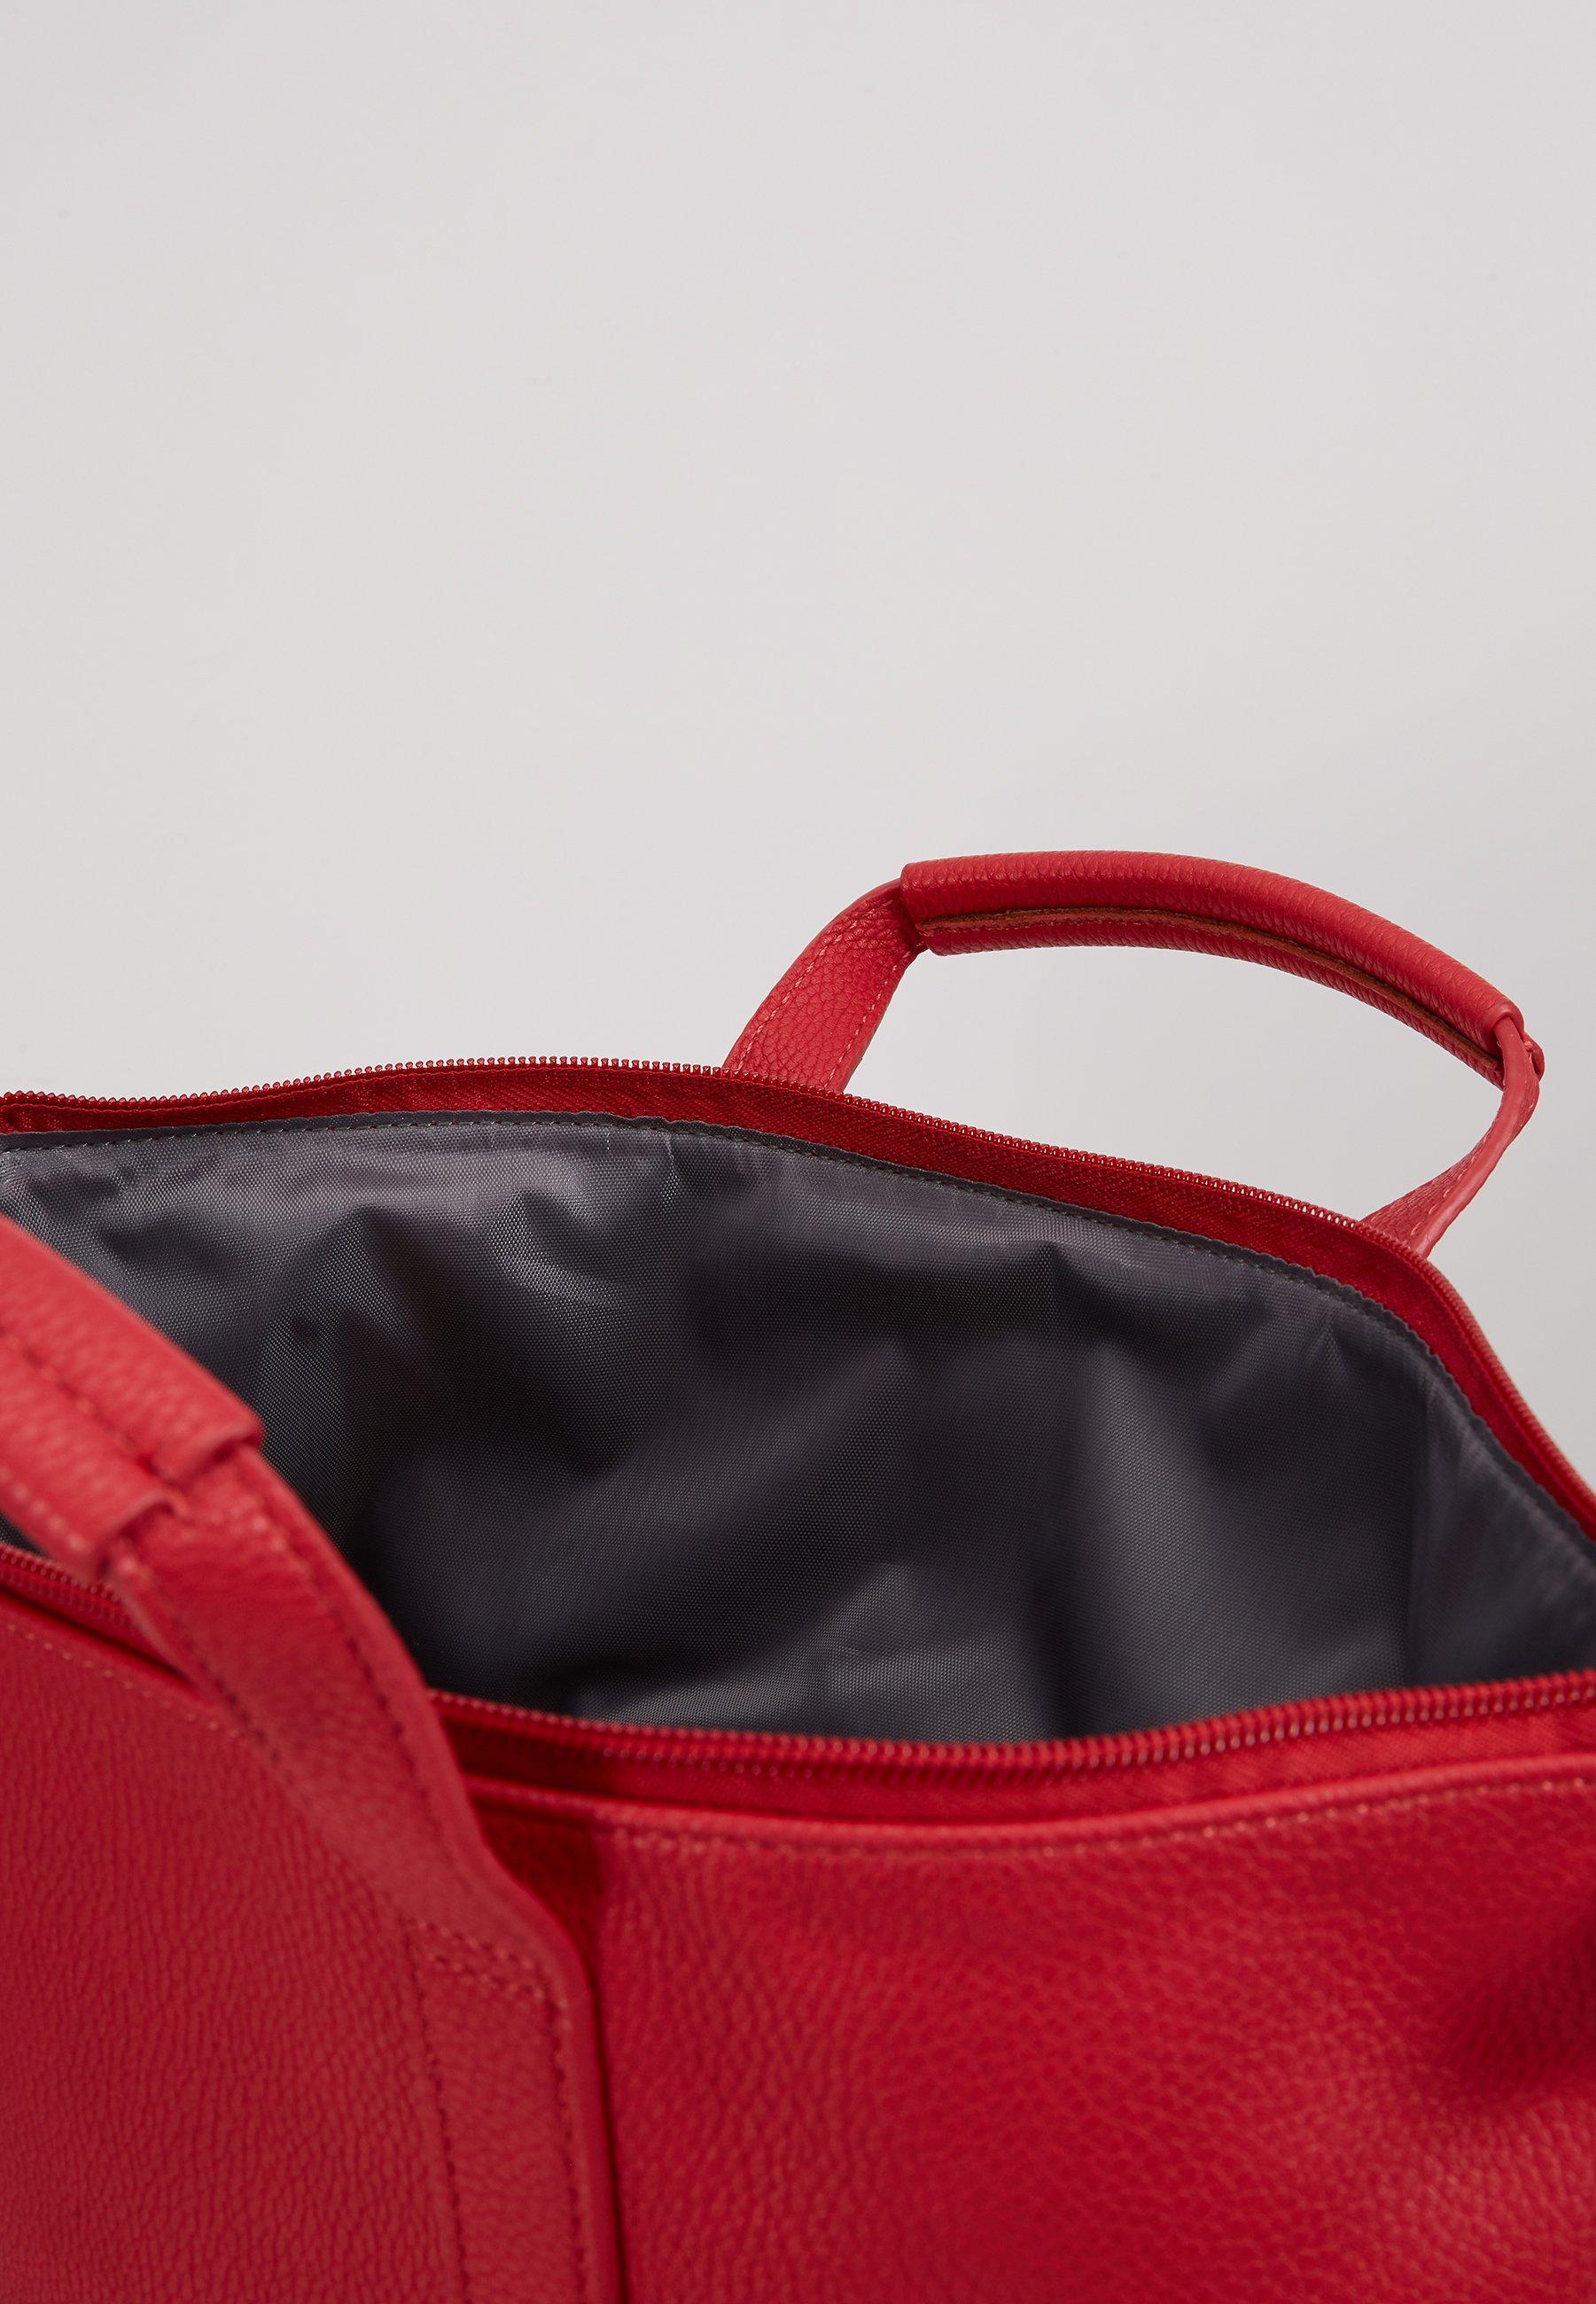 Jost X-change - Plecak Brick